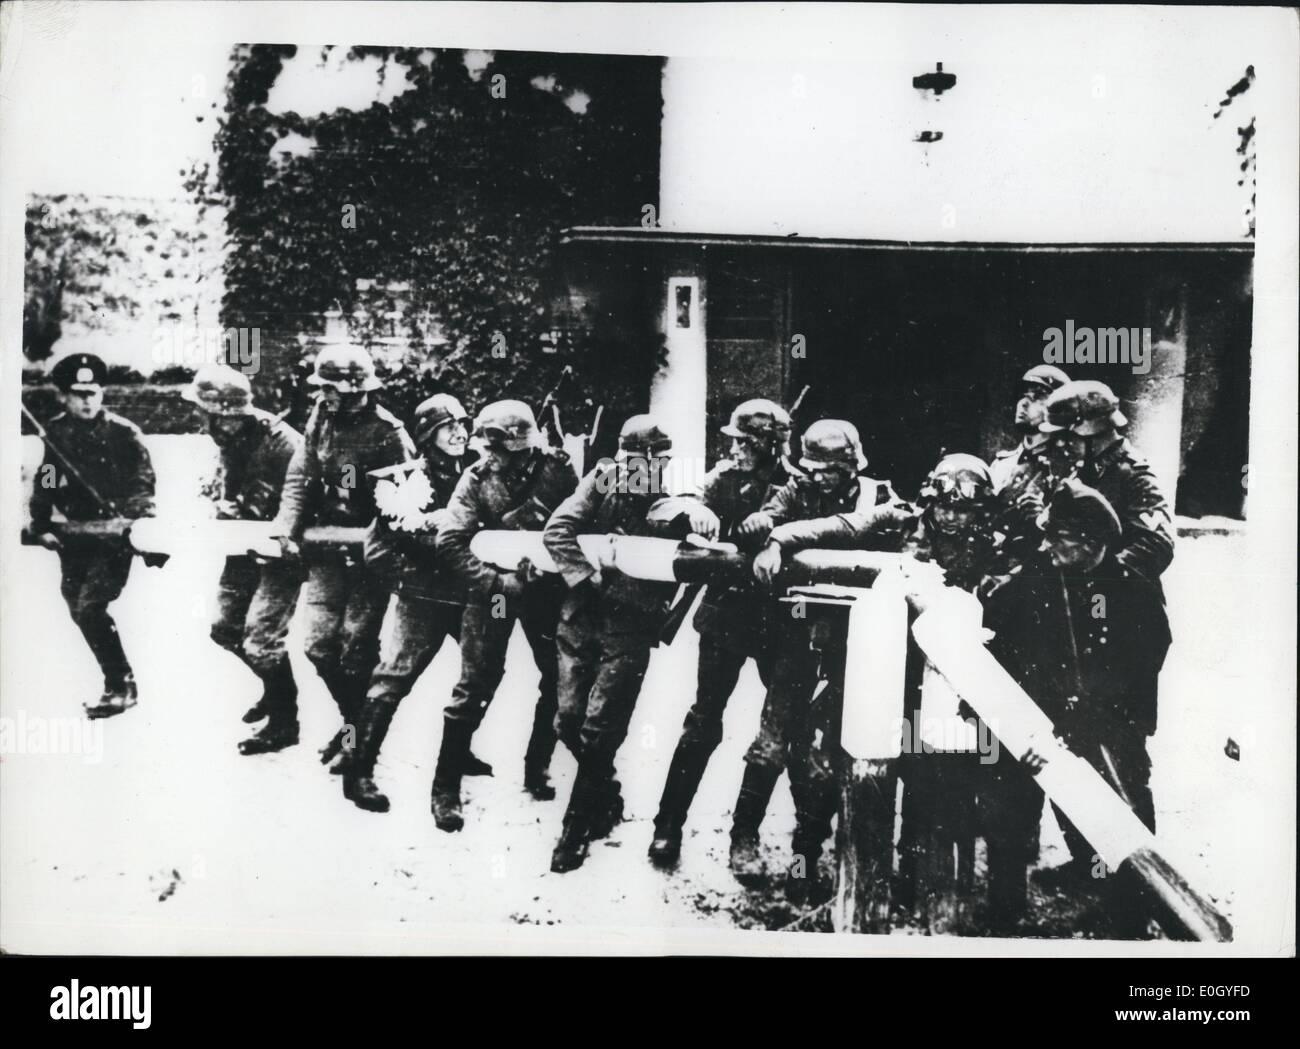 Jan 1, 1940 - Twentieth Anniversary Of The Outbreak Of World War II. Photo shows German troops breaking down turnpikes - Stock Image